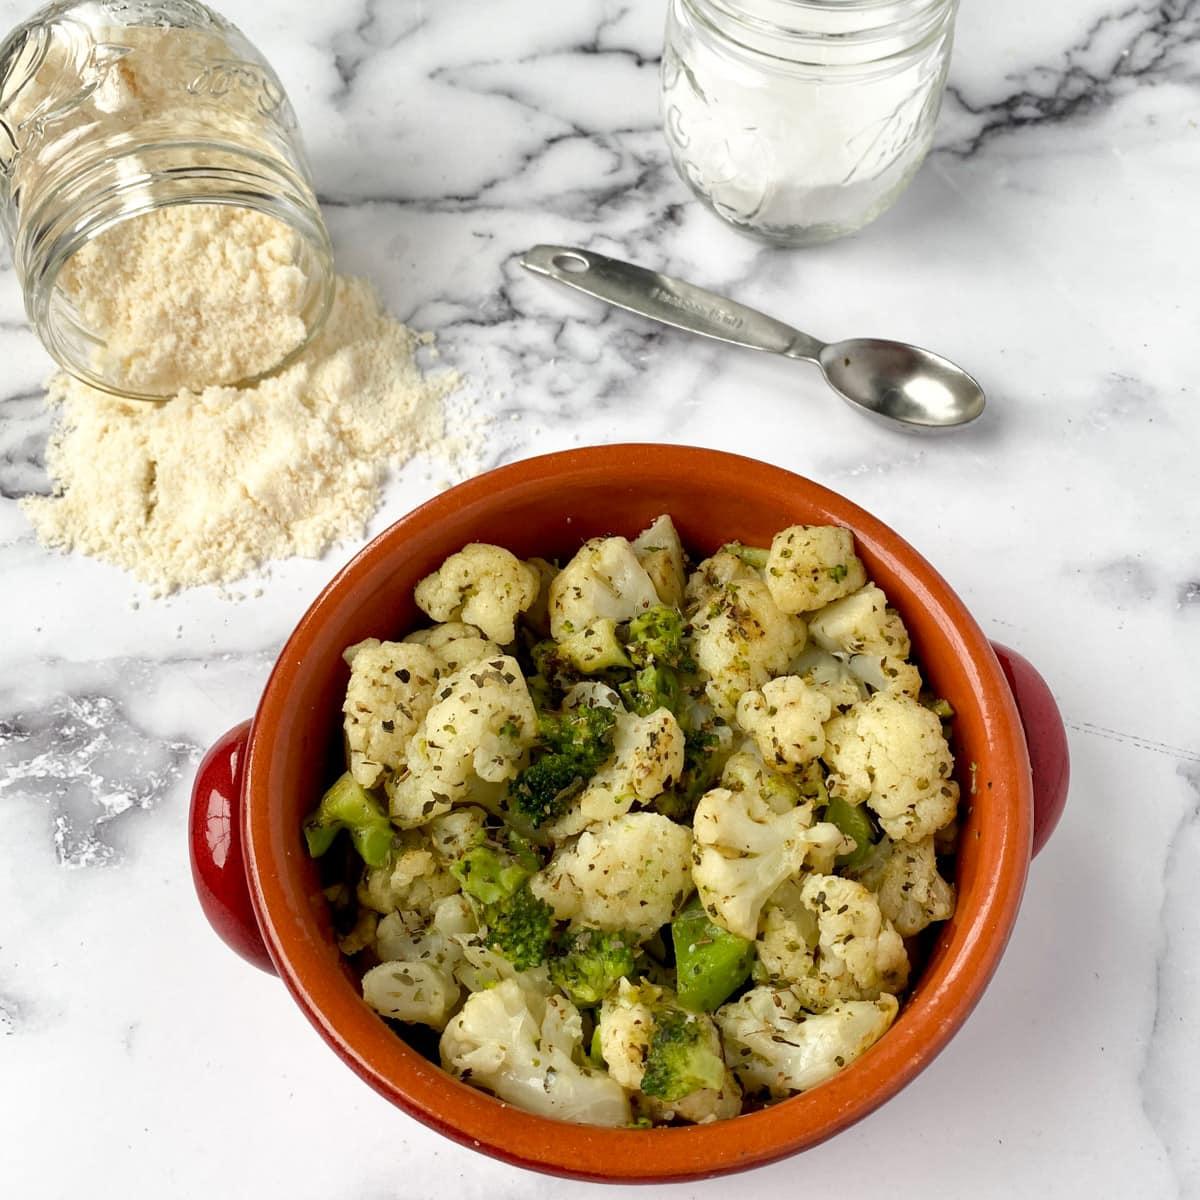 Sauteed Frozen Broccoli And Cauliflower Pinch Of Wellness